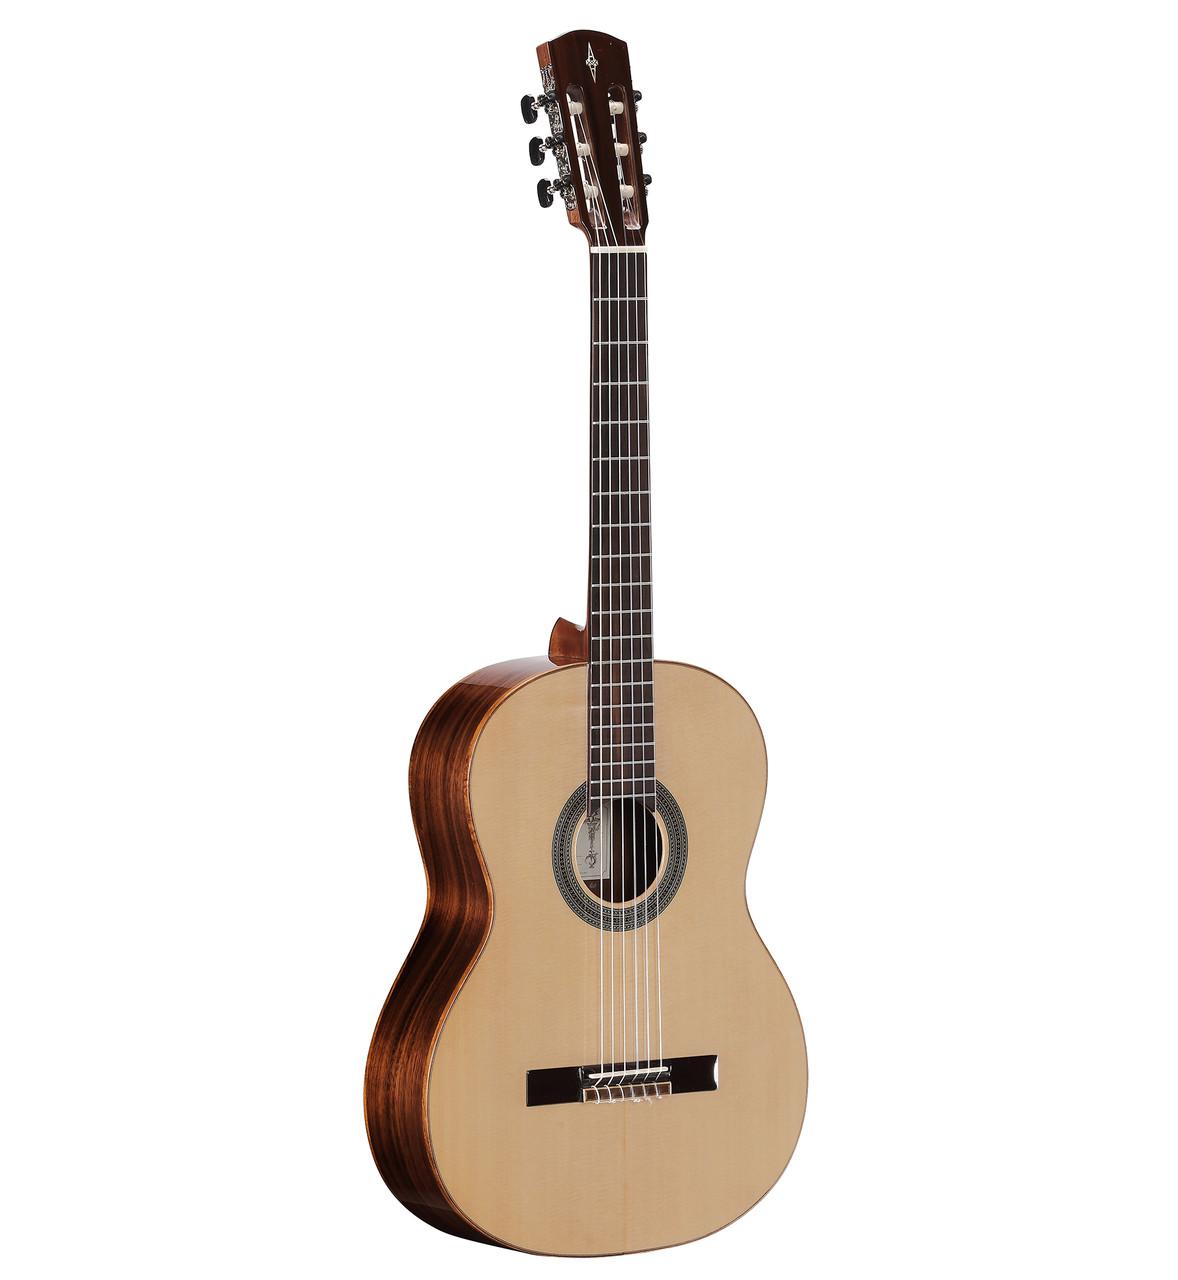 Alvarez Cadiz CC7 Concert Classical Guitar